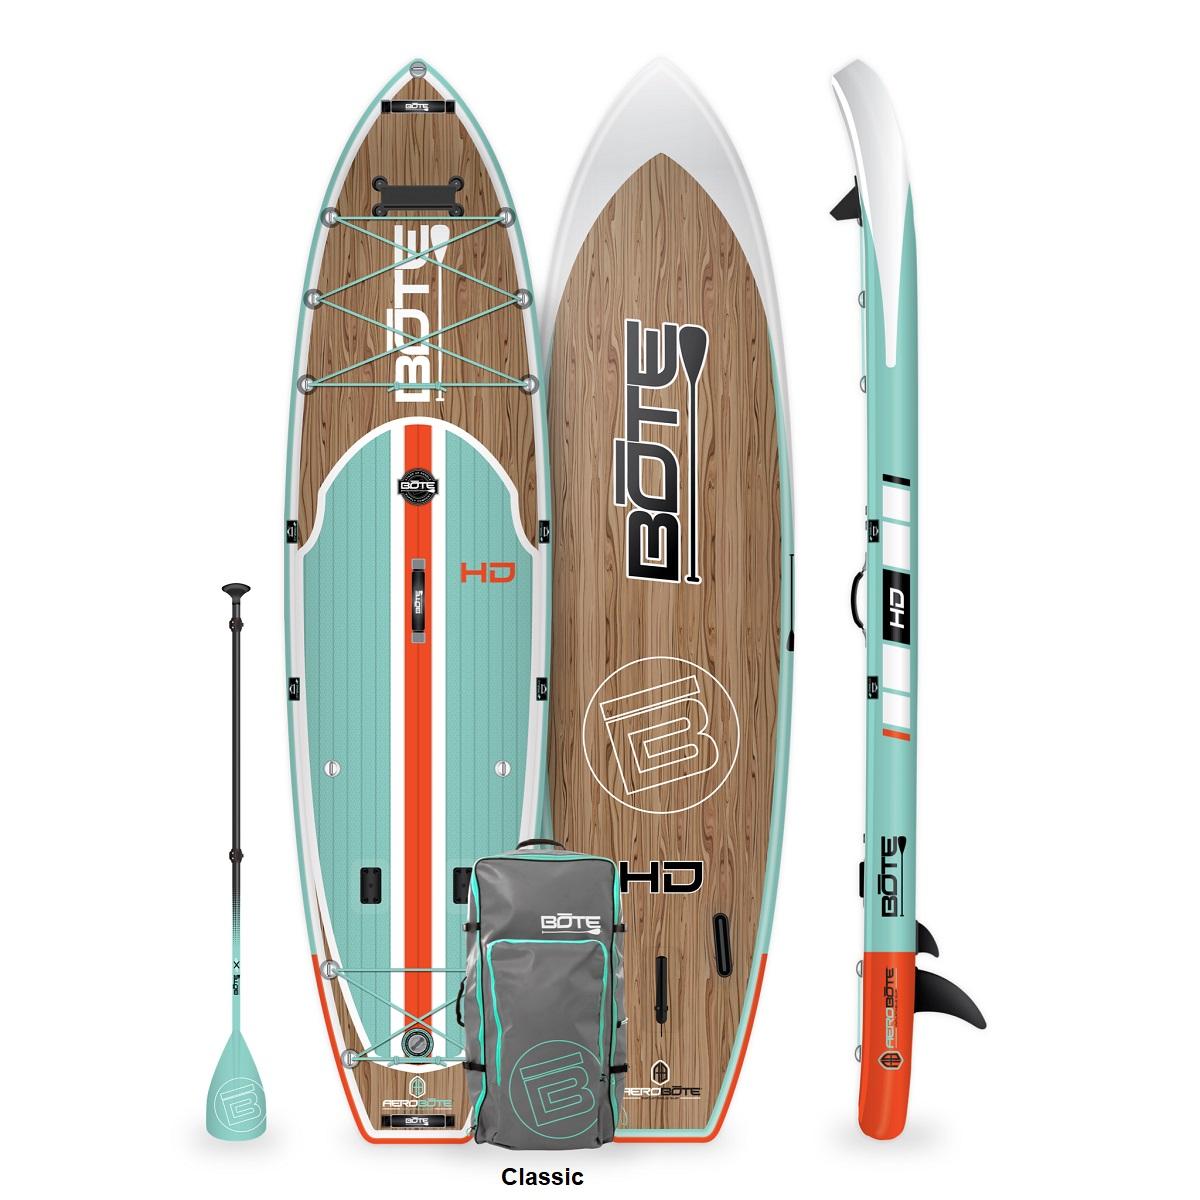 BOTE HD Aero Paddle Board - Classic